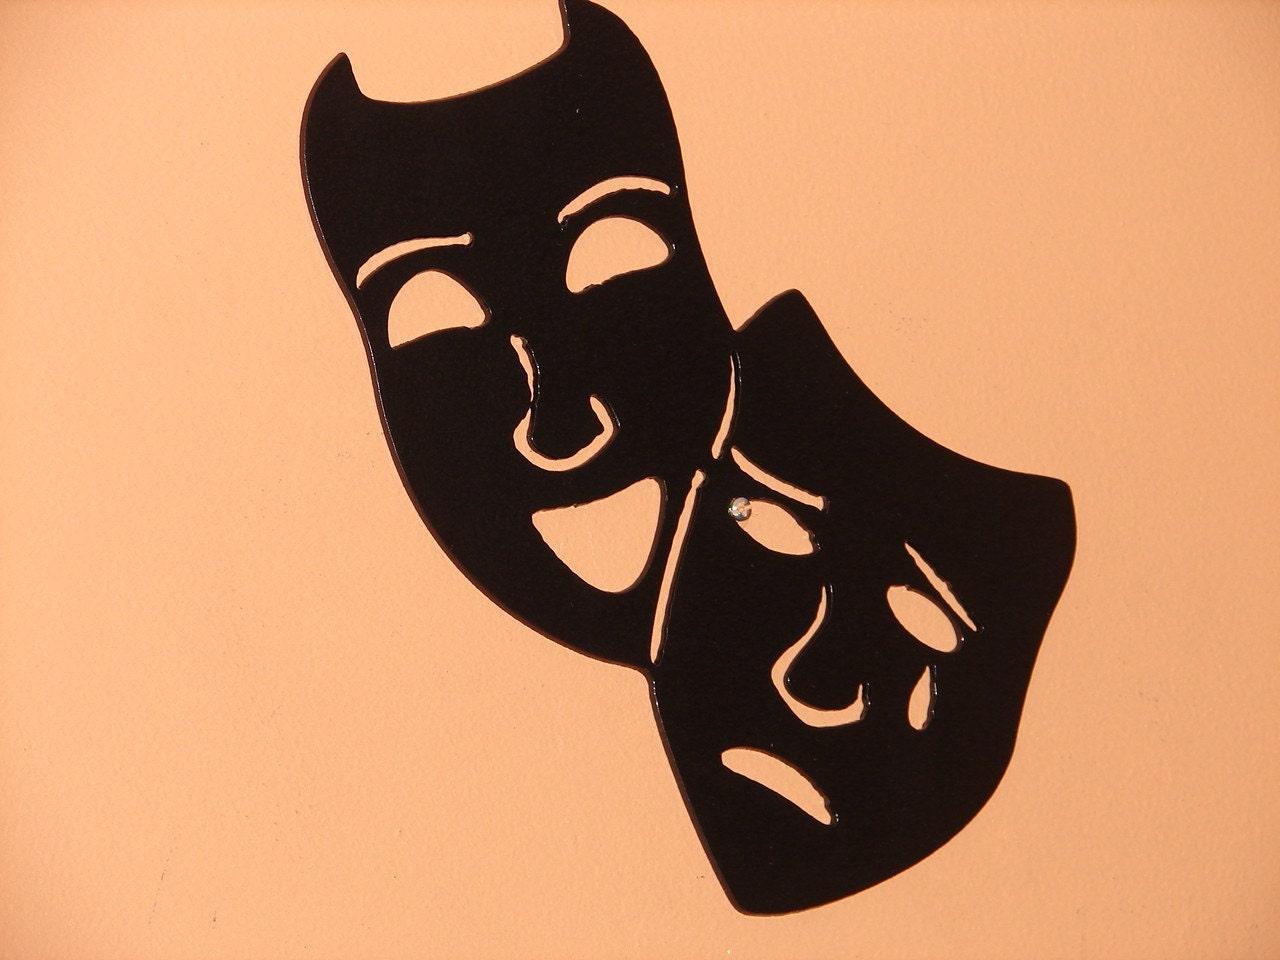 home theater mask metal wall art decor movie film by artbyjack. Black Bedroom Furniture Sets. Home Design Ideas